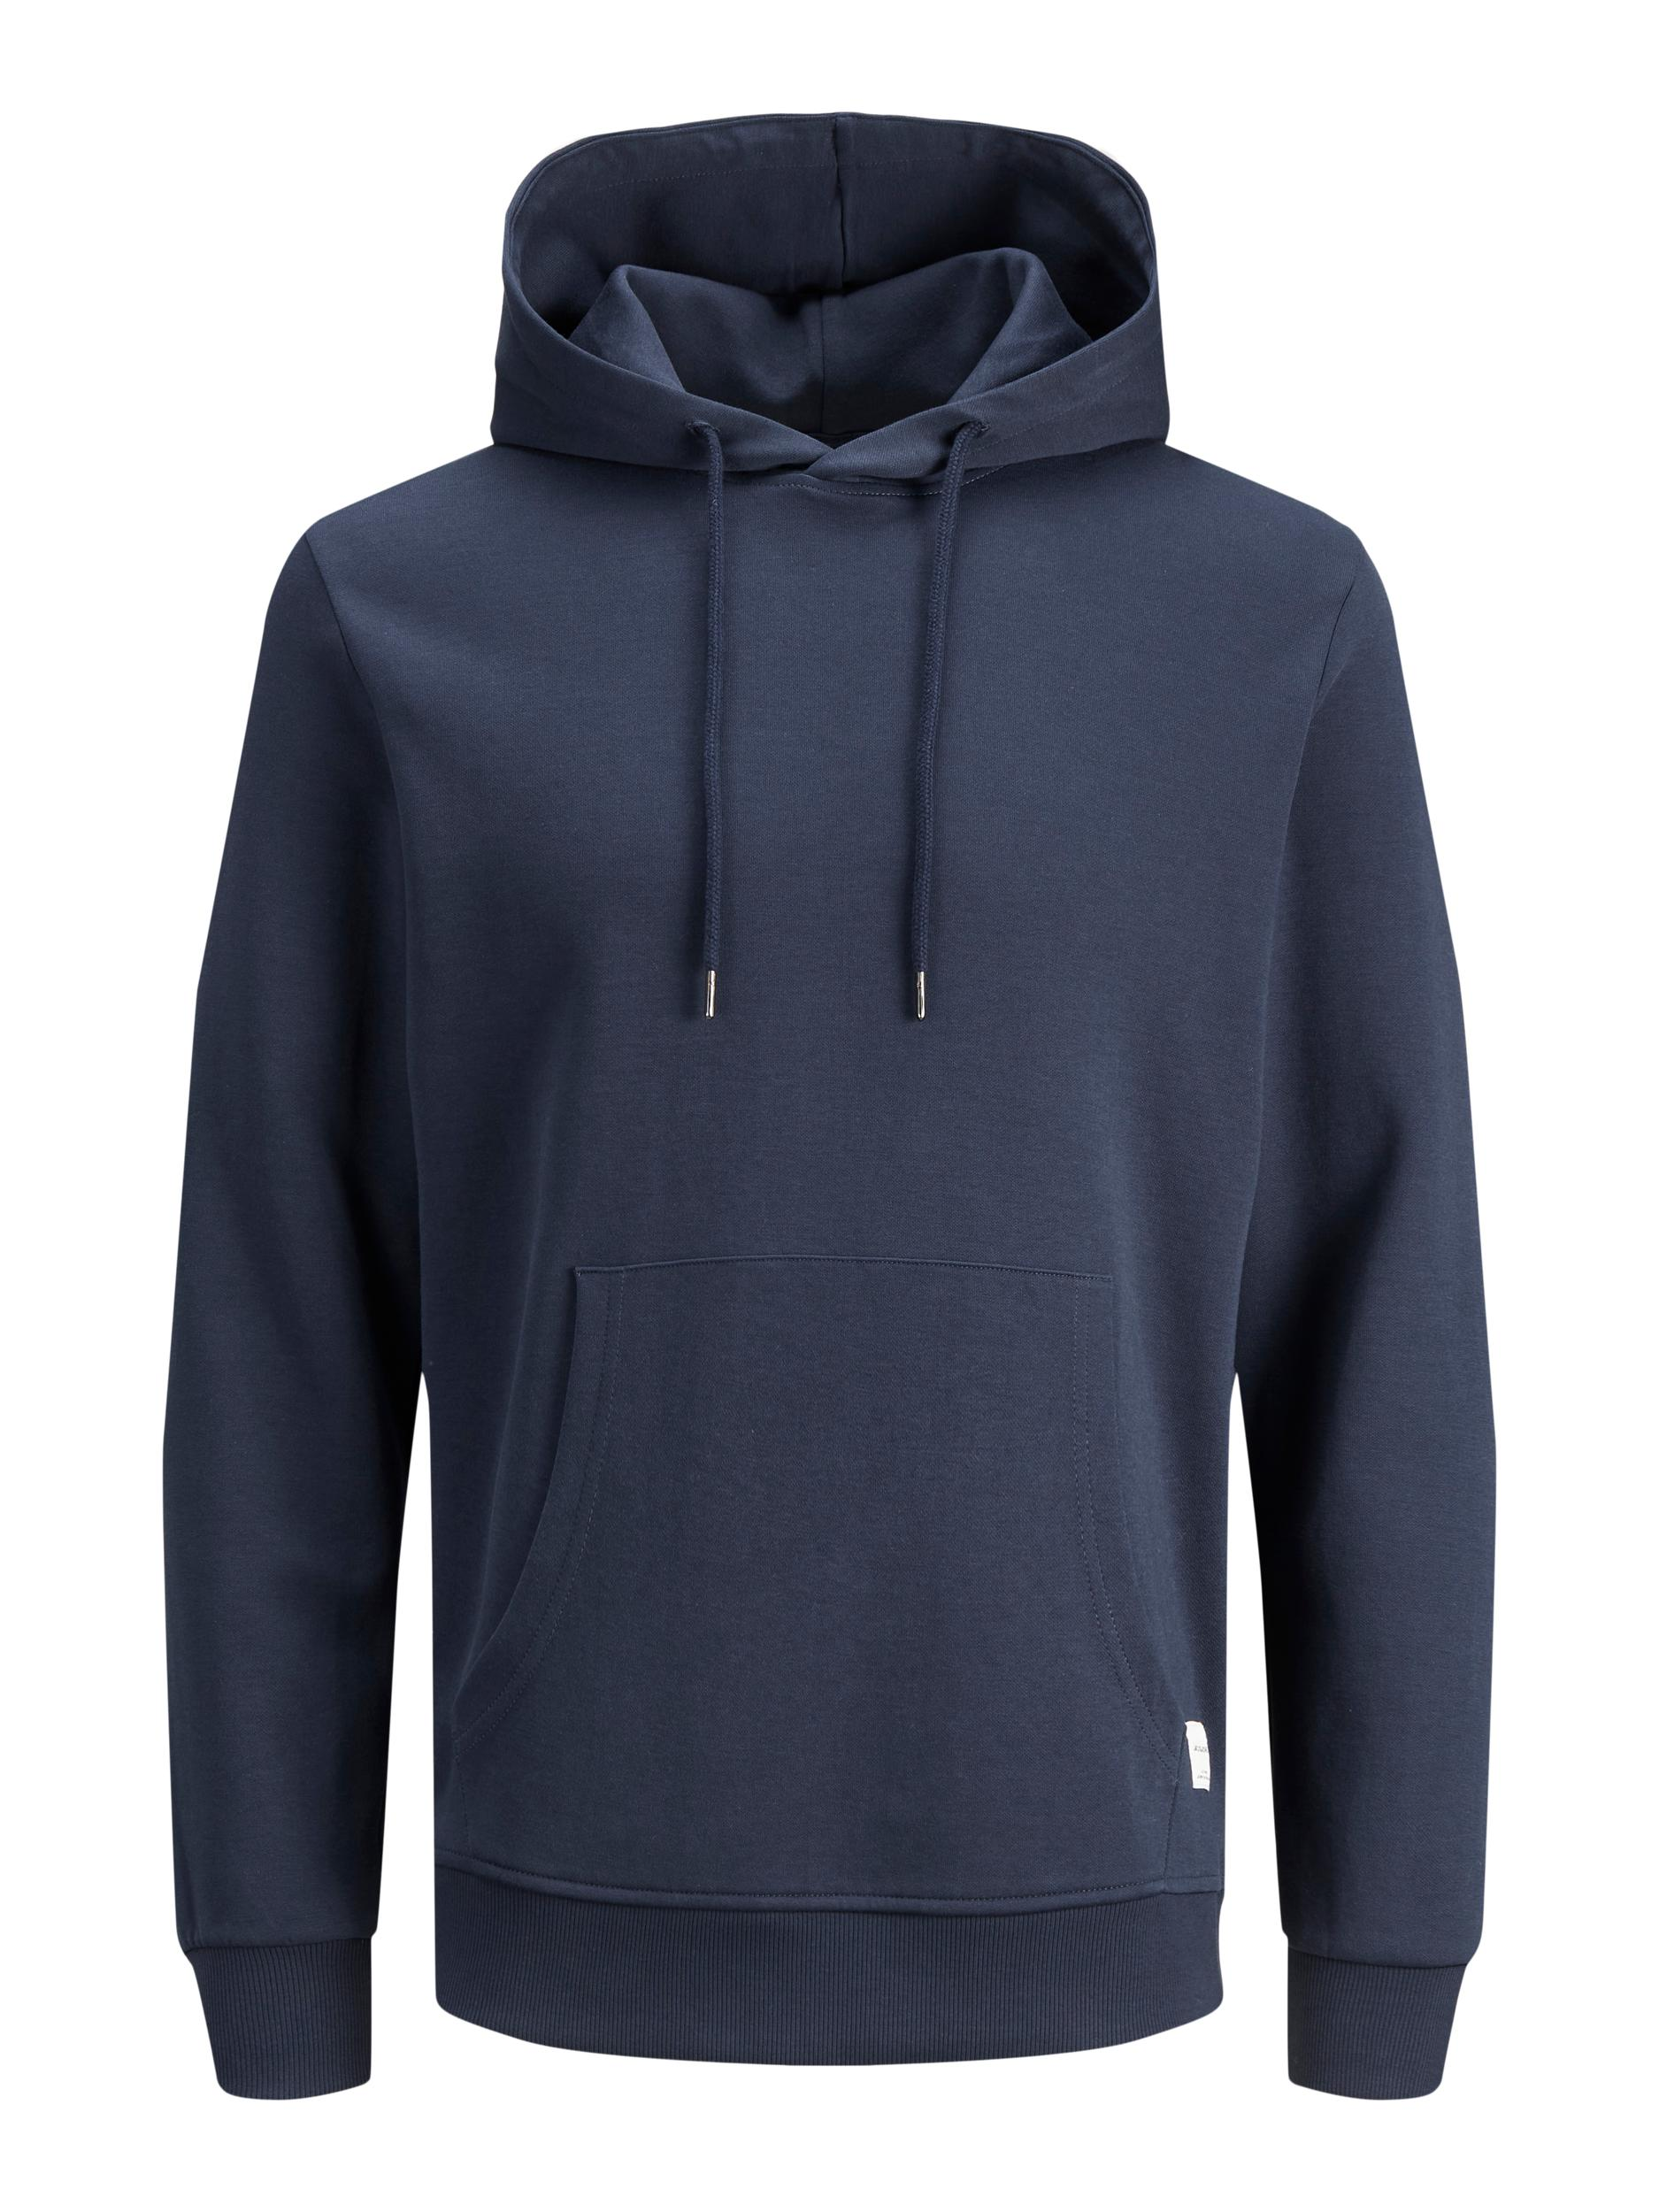 Jack & Jones Sweat hoodie, navy blazer, medium